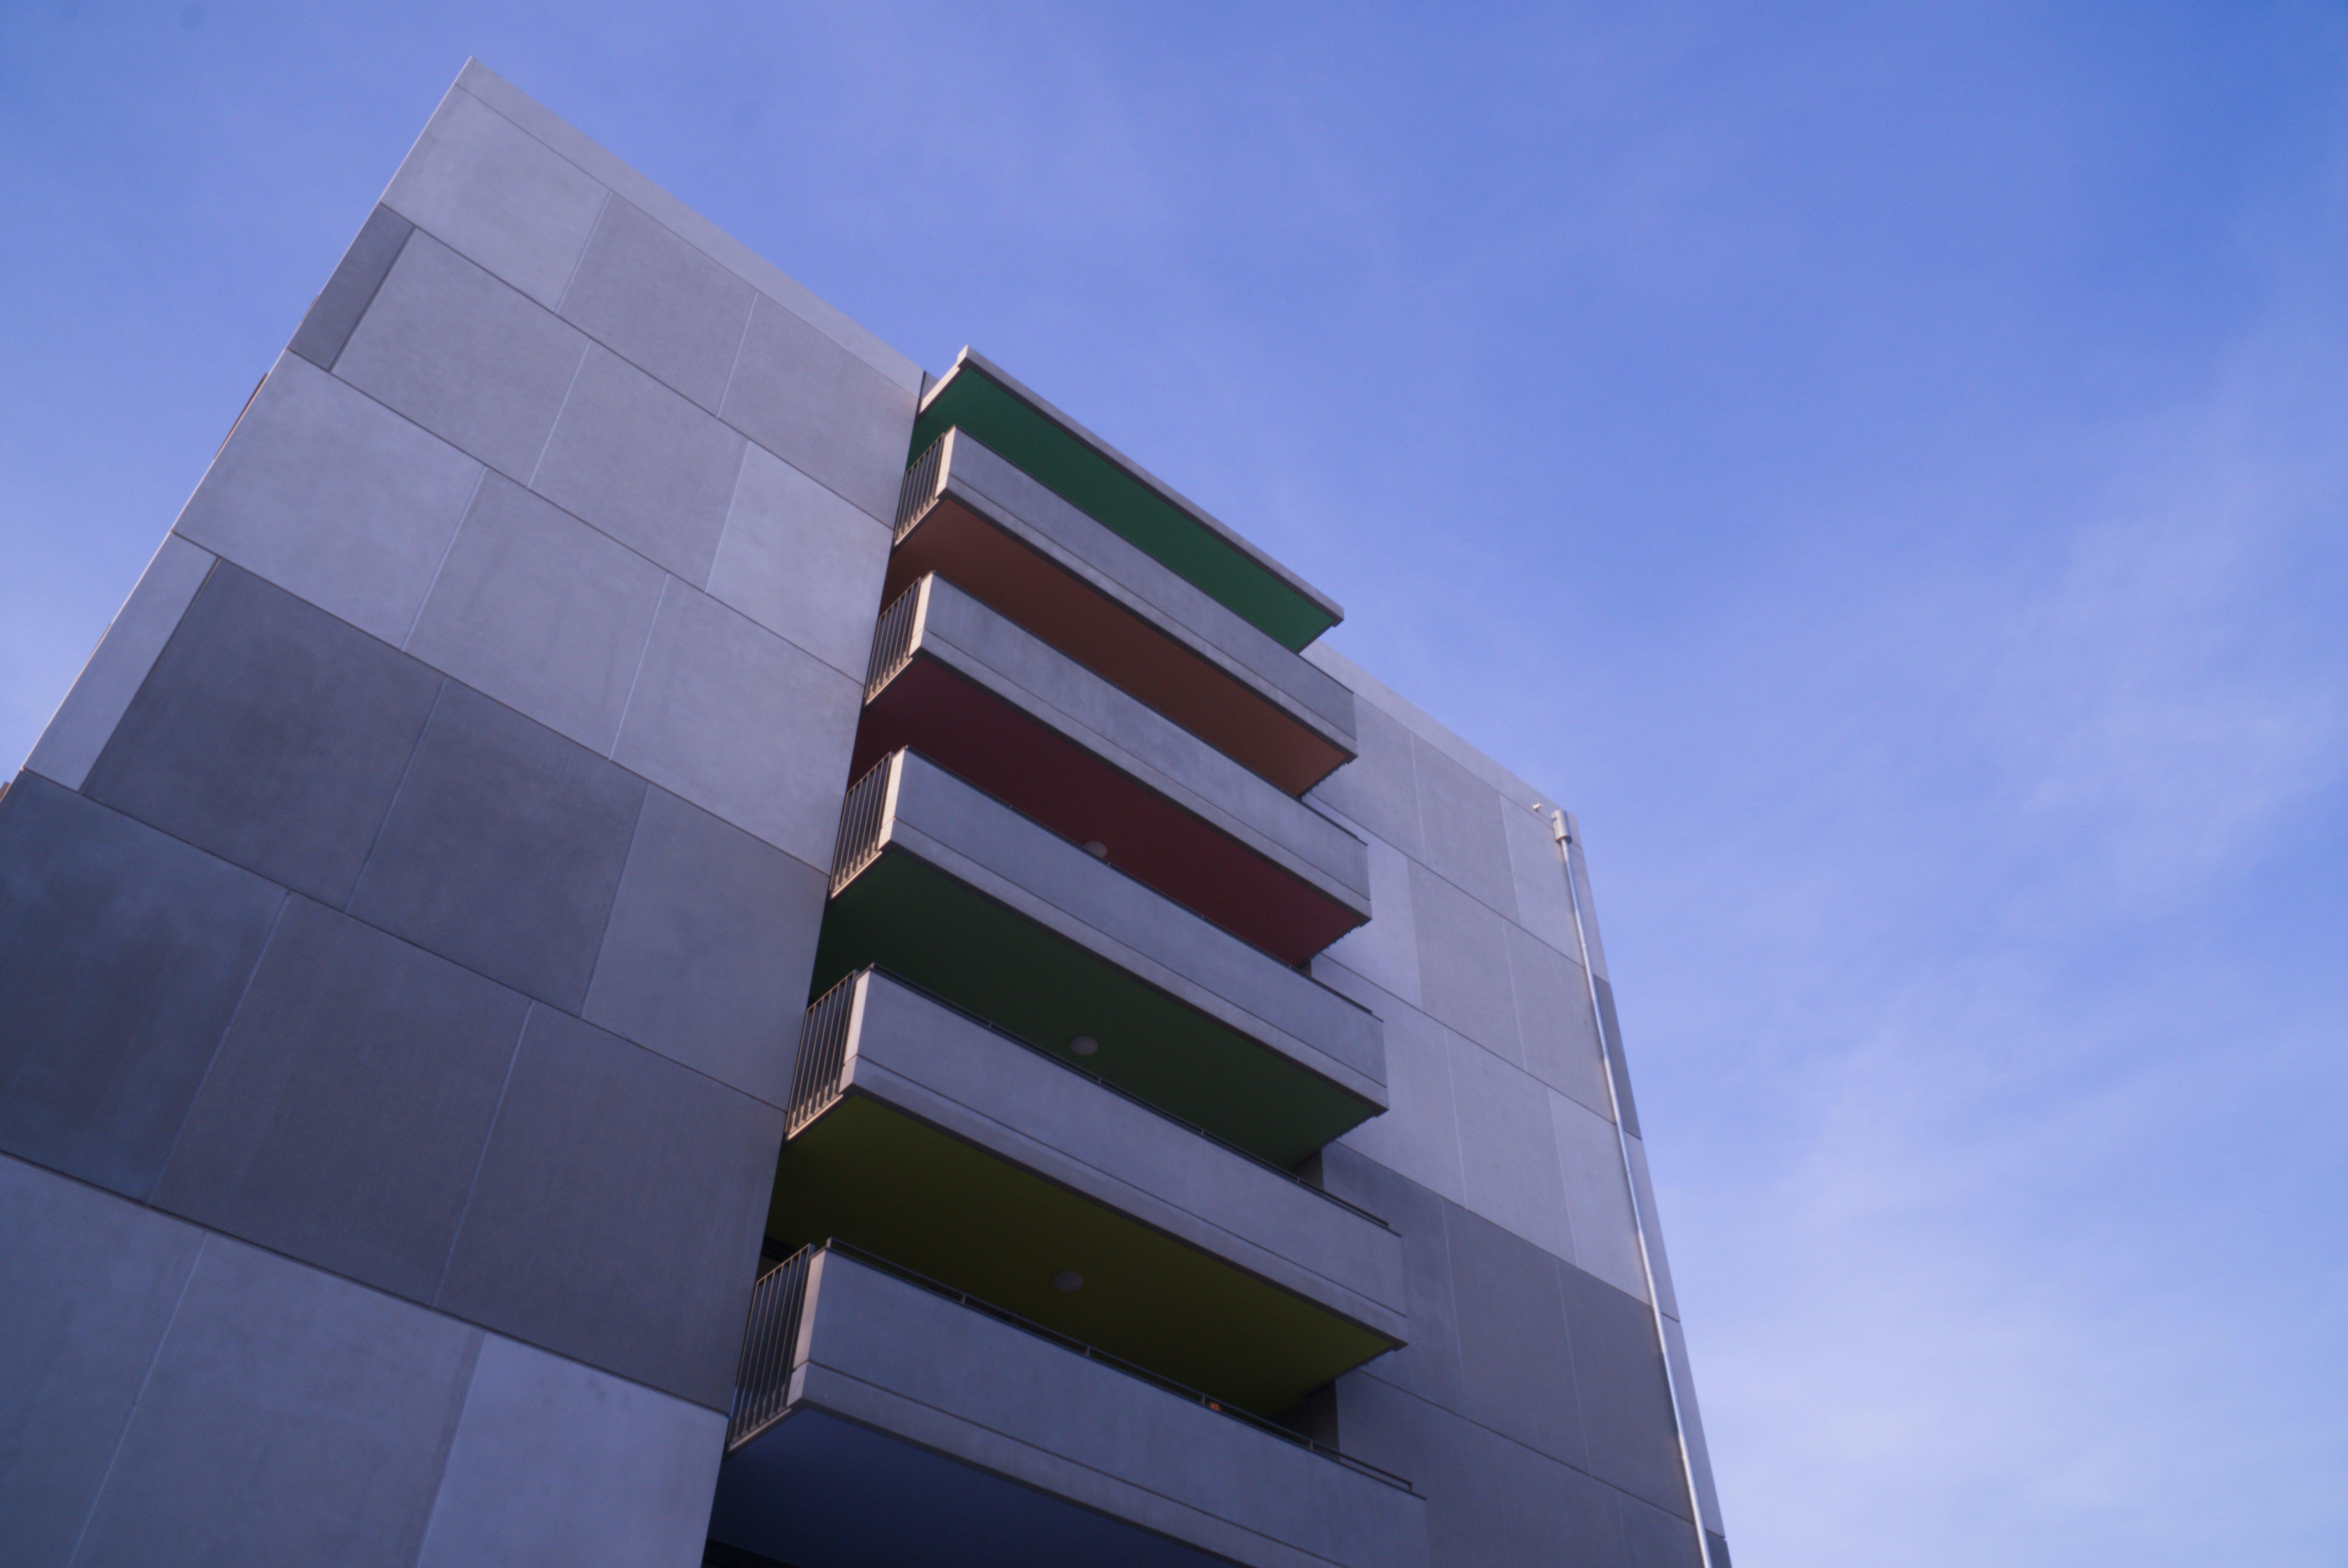 Free stock photo of blue sky, building, city, concrete